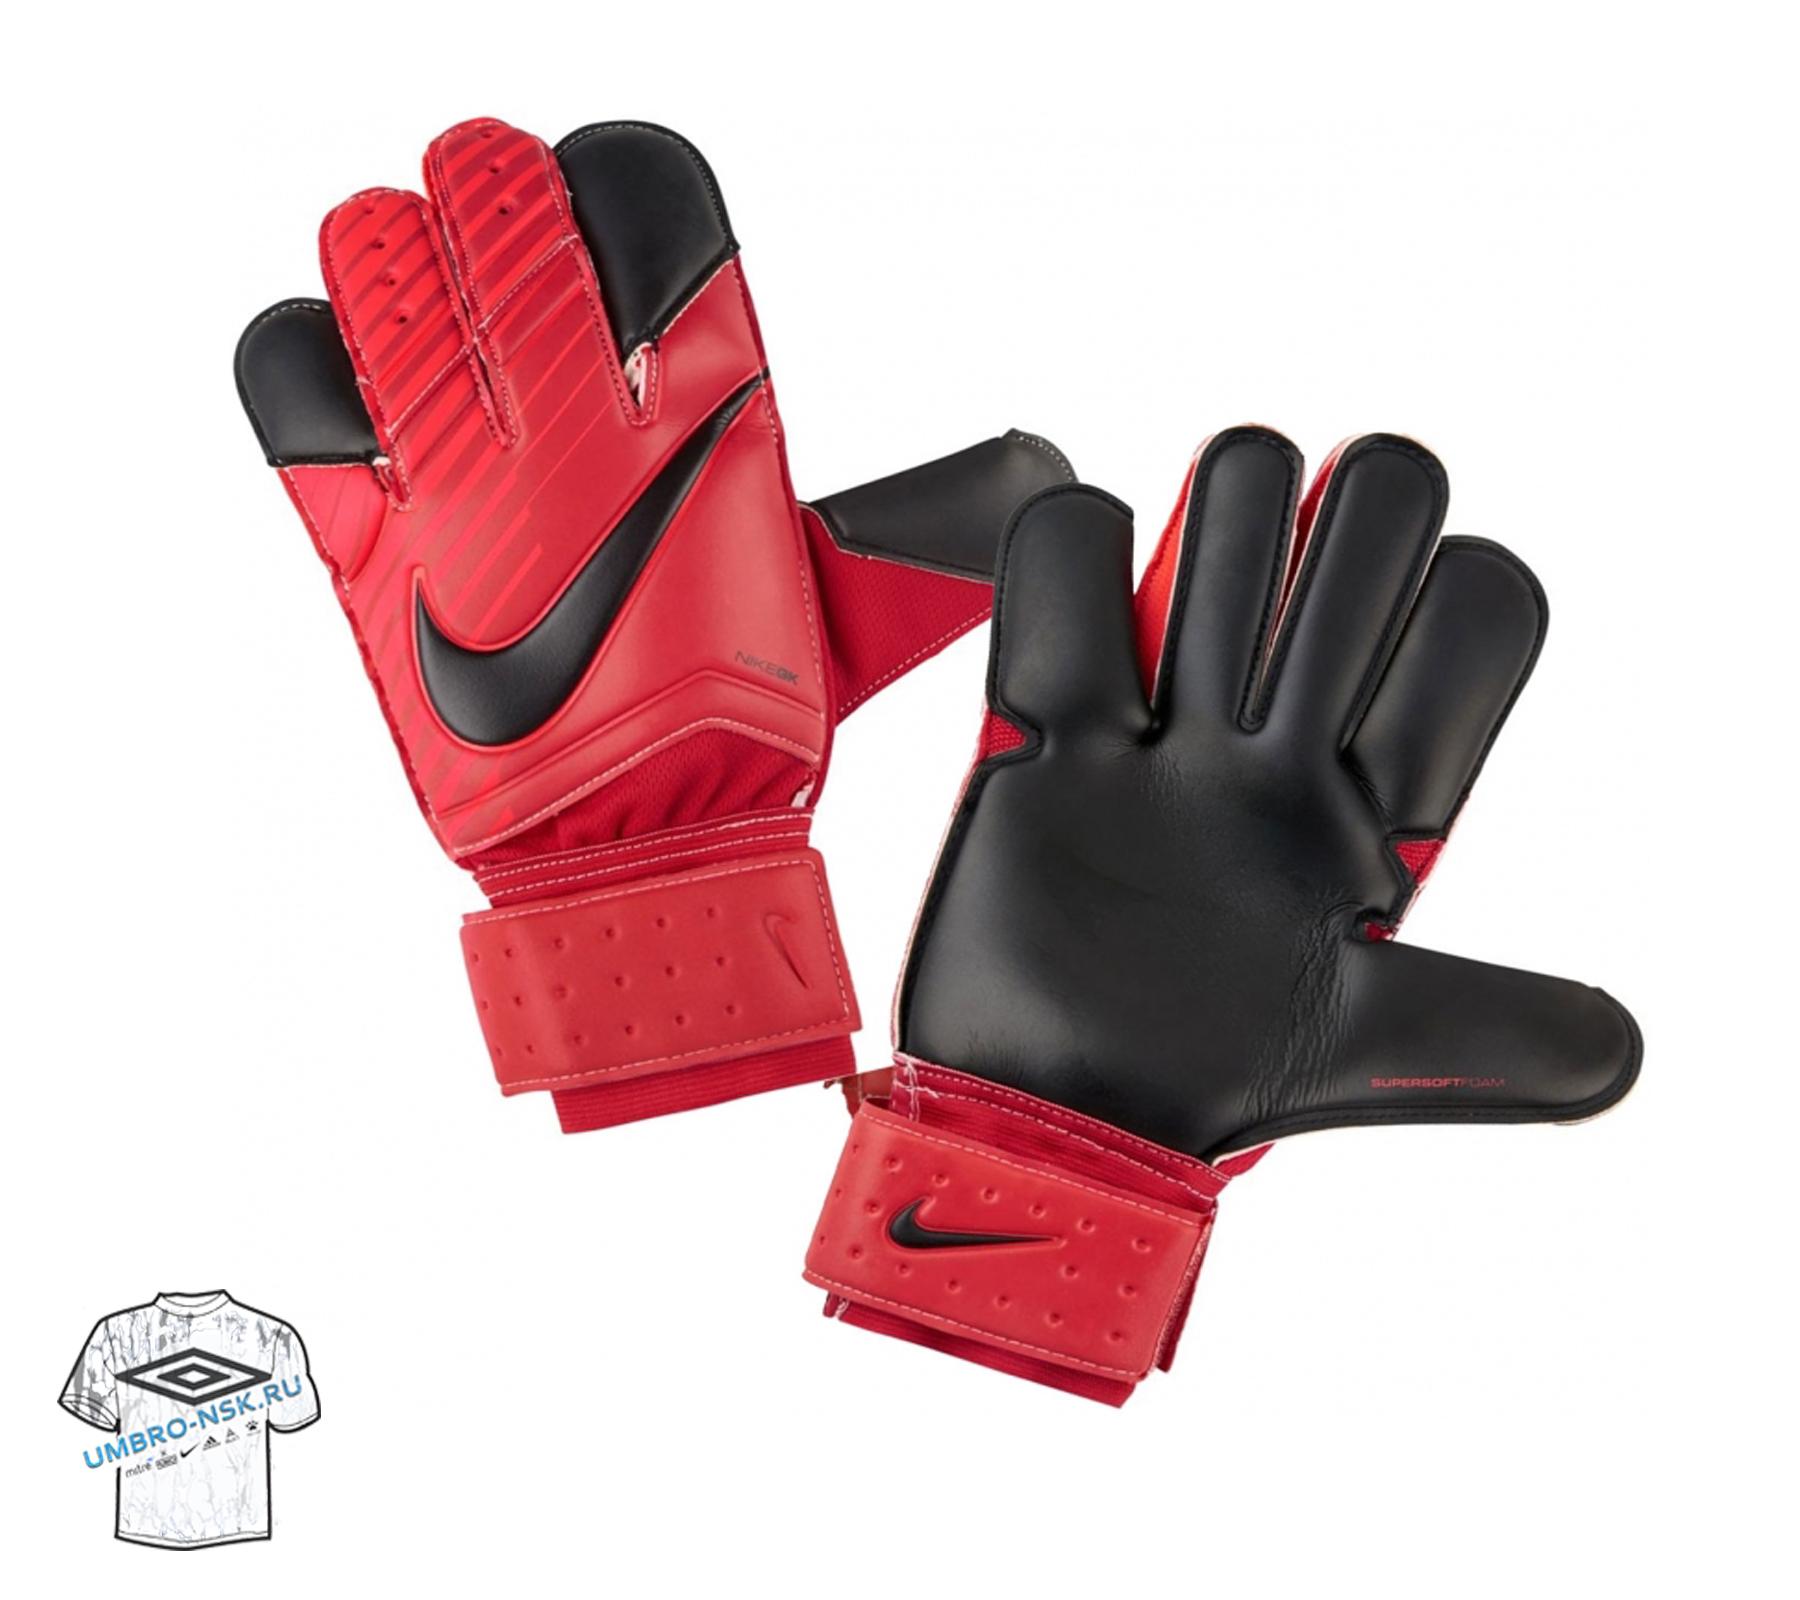 вратарские перчатки nike grip 3